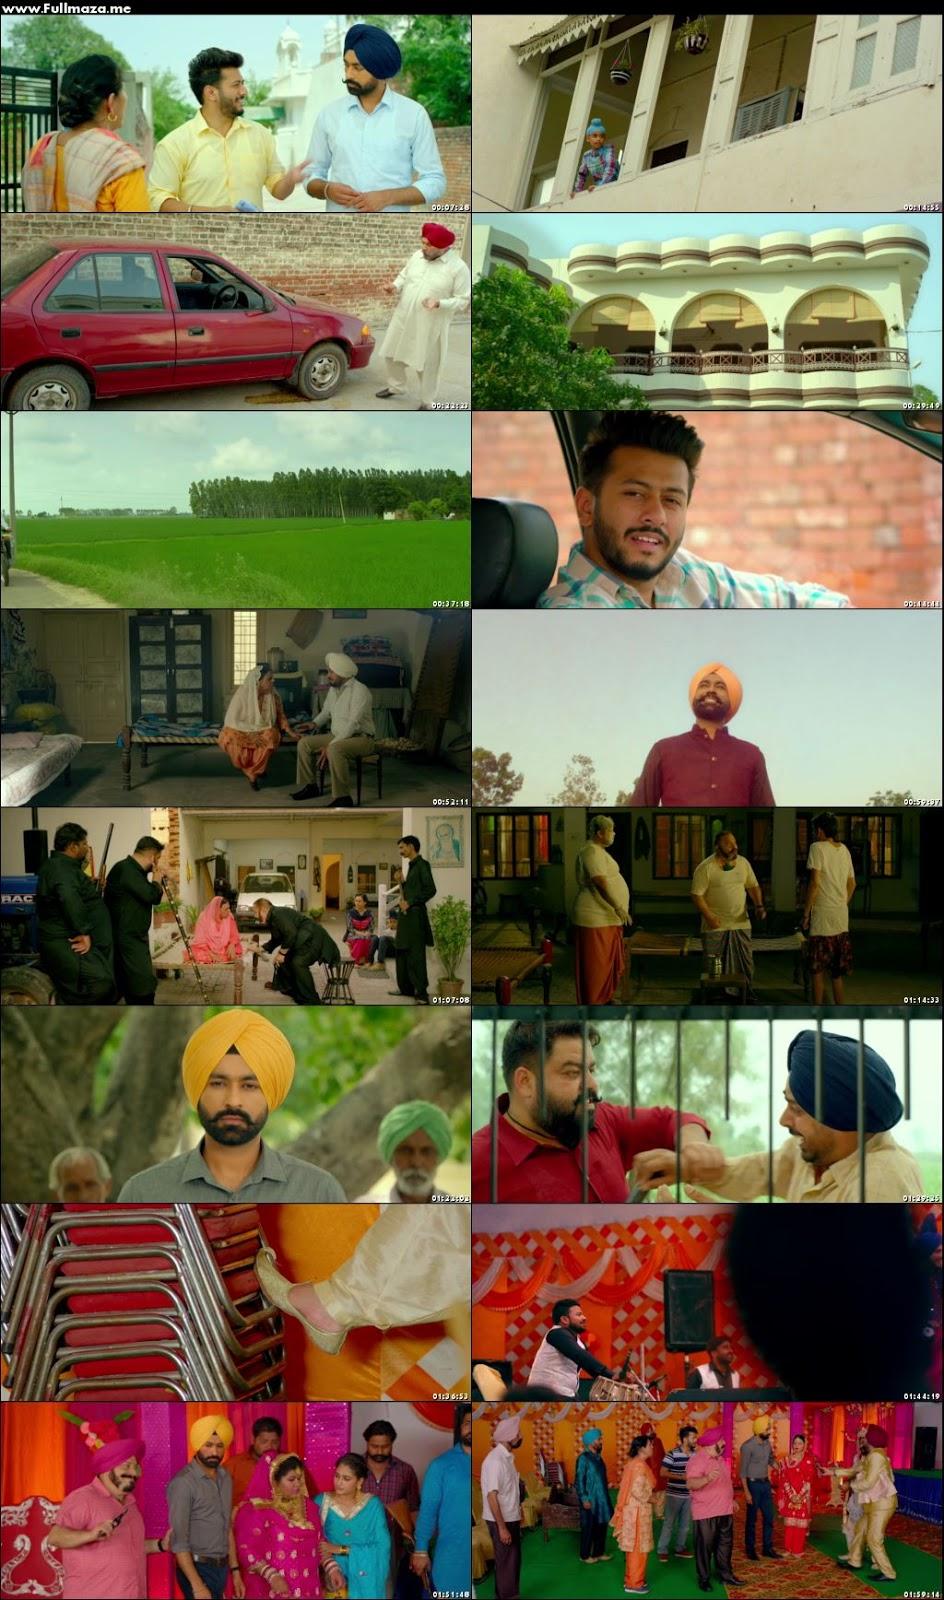 Afsar 2018 Punjabi Movie 480p Hdrip 340mb Khatrimazafullpro